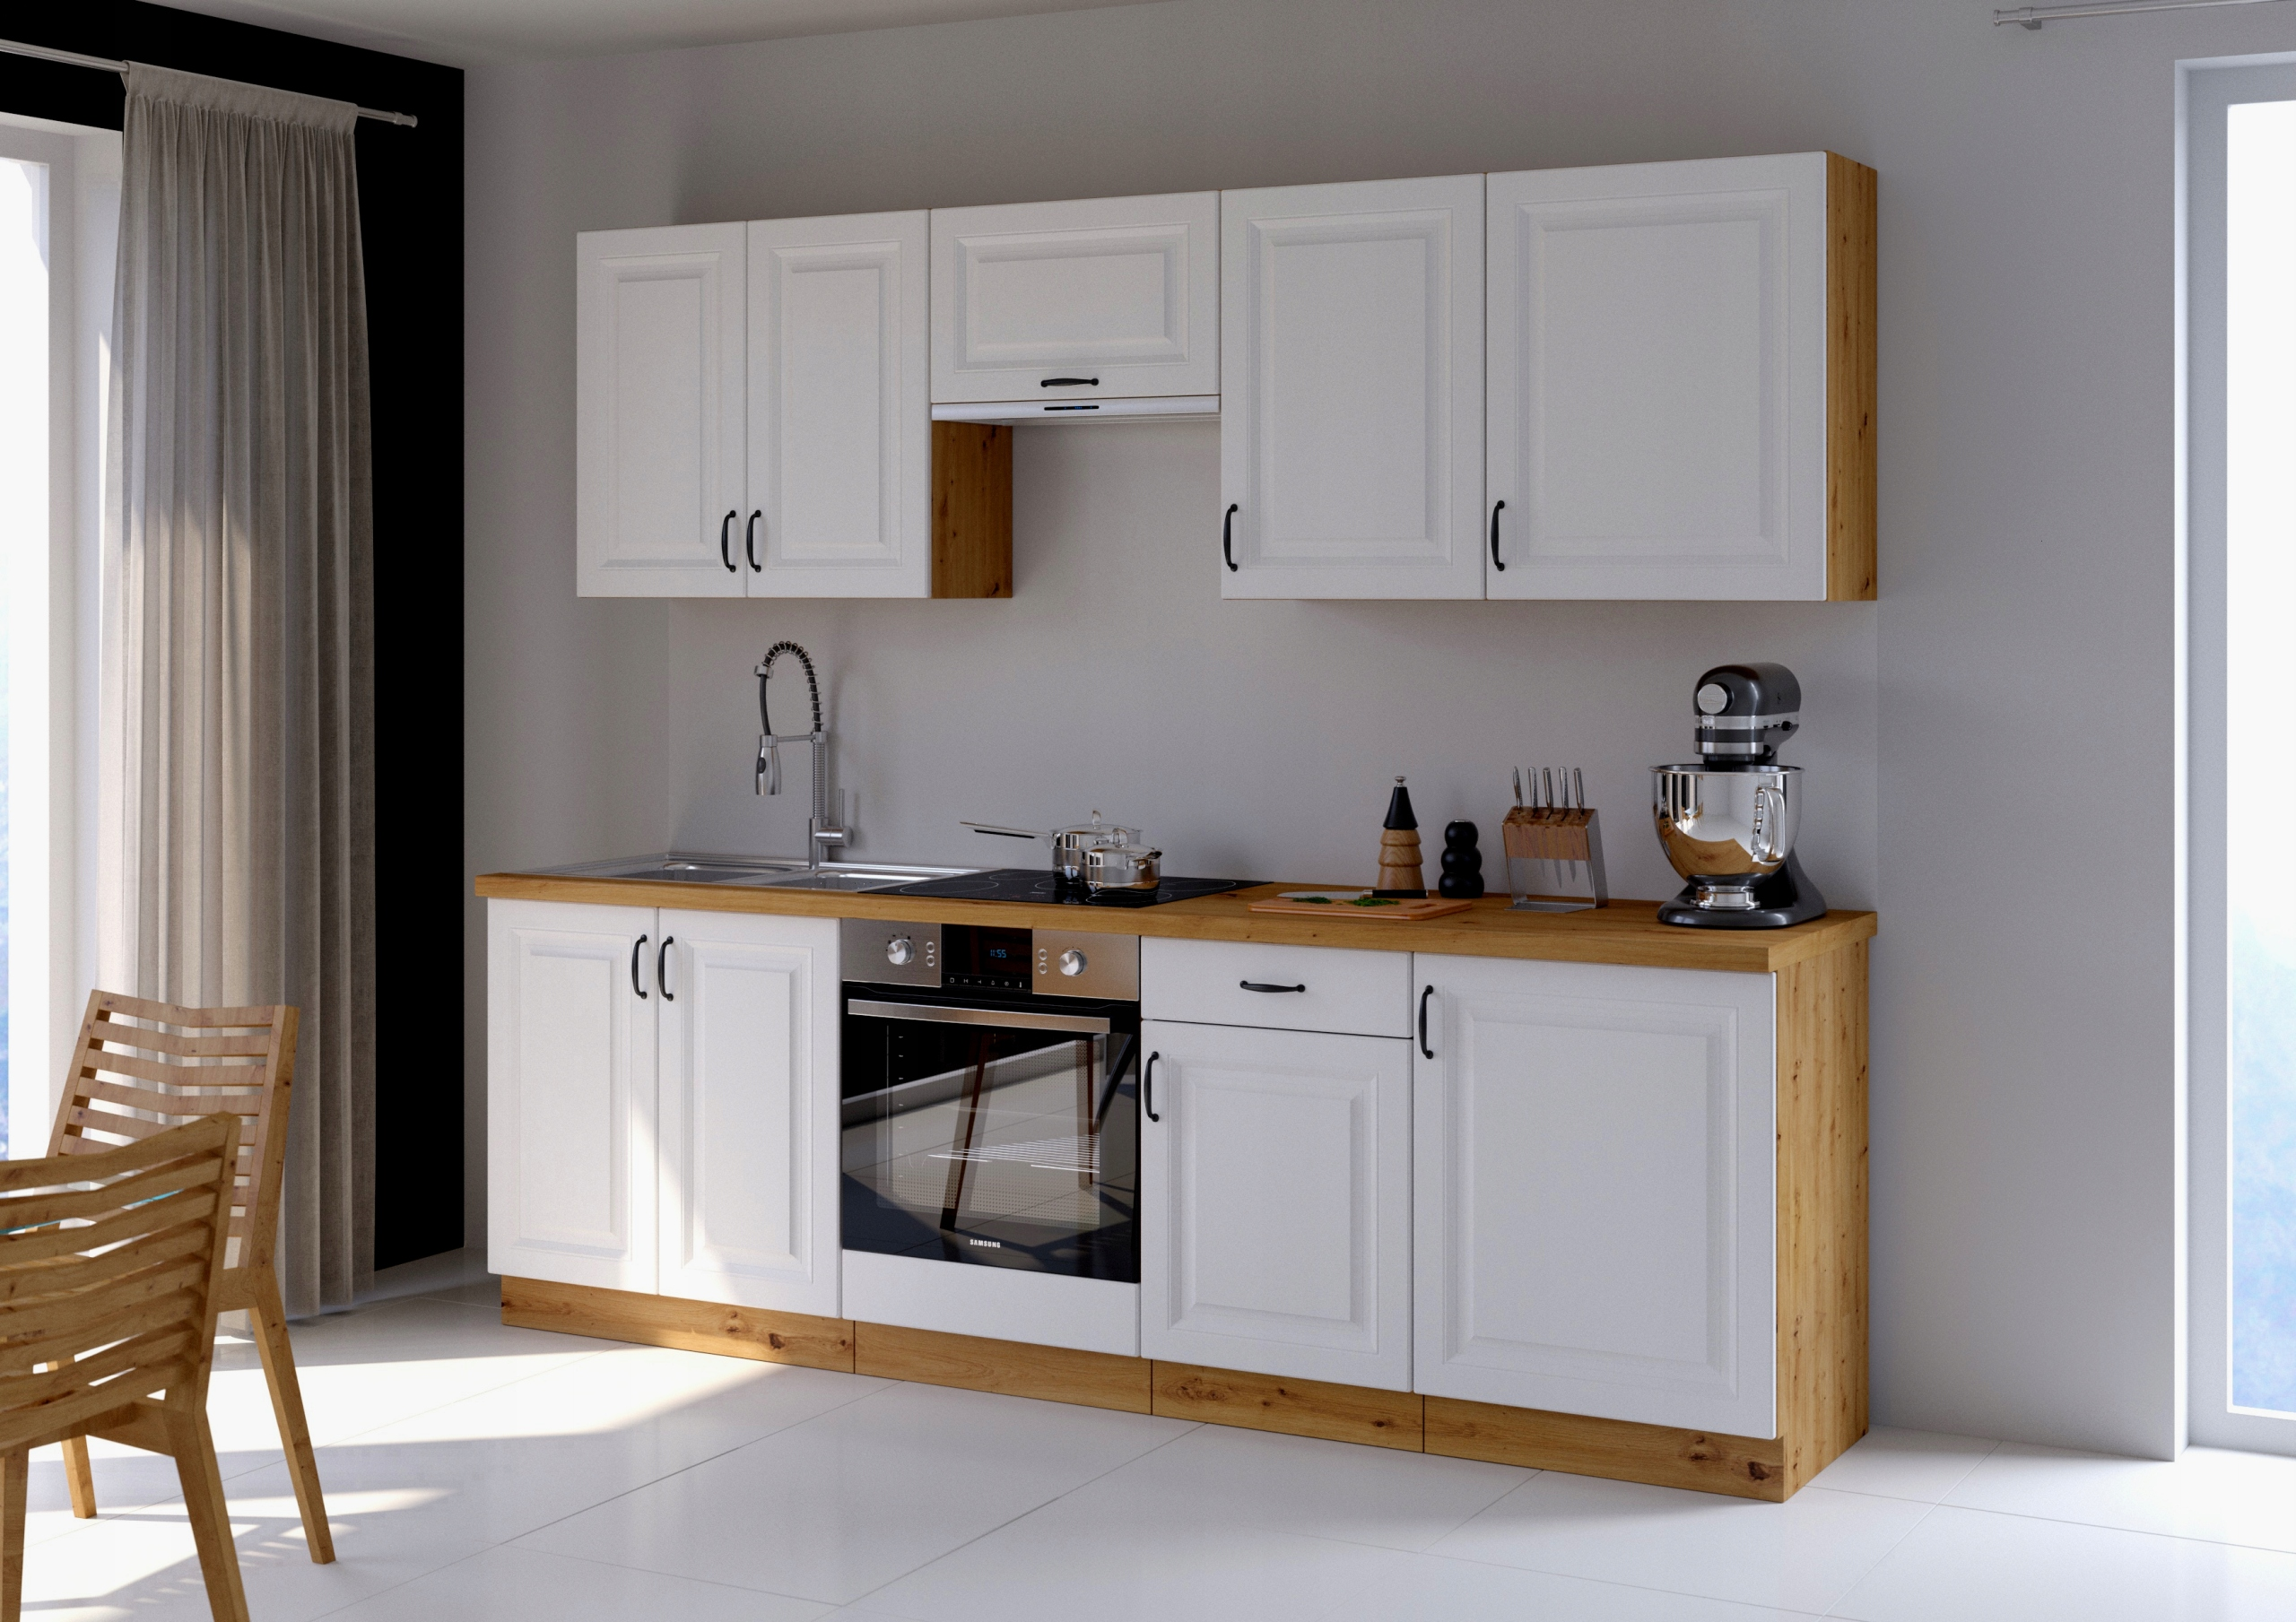 sada kuchynského nábytku RETRO 250cm BIELY MAT